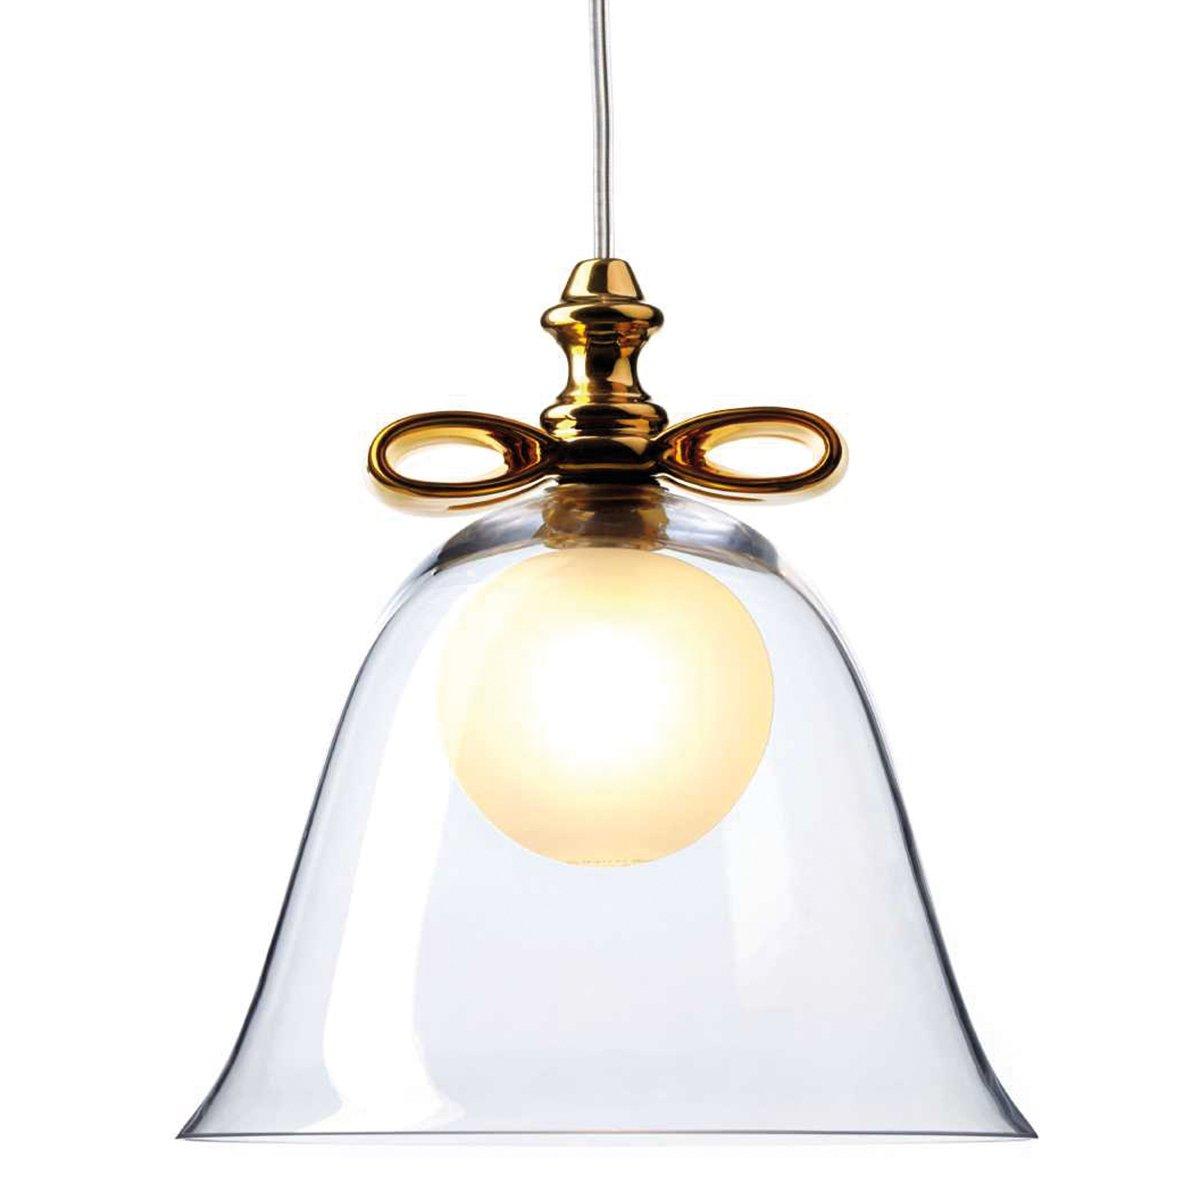 Moooi Bell Hanglamp Transparant - Goud